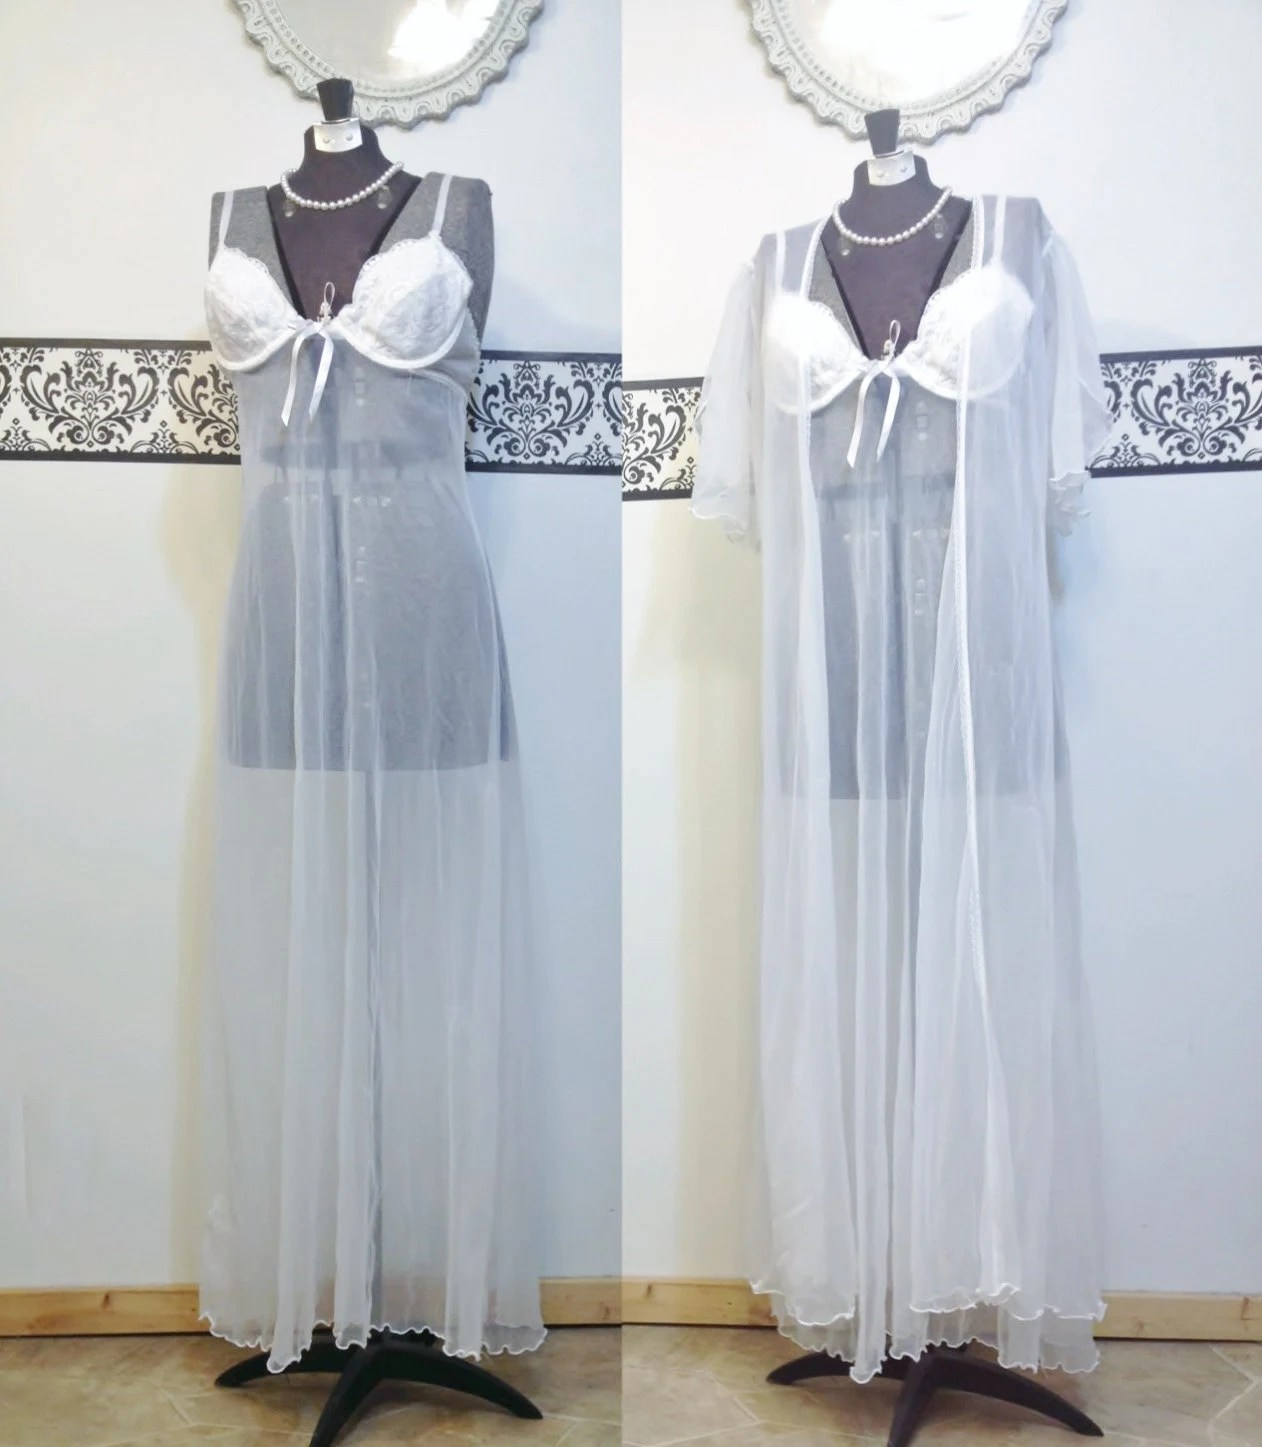 Vintage Sheer White Floor Length Pin Up Nightgown  Peignoir